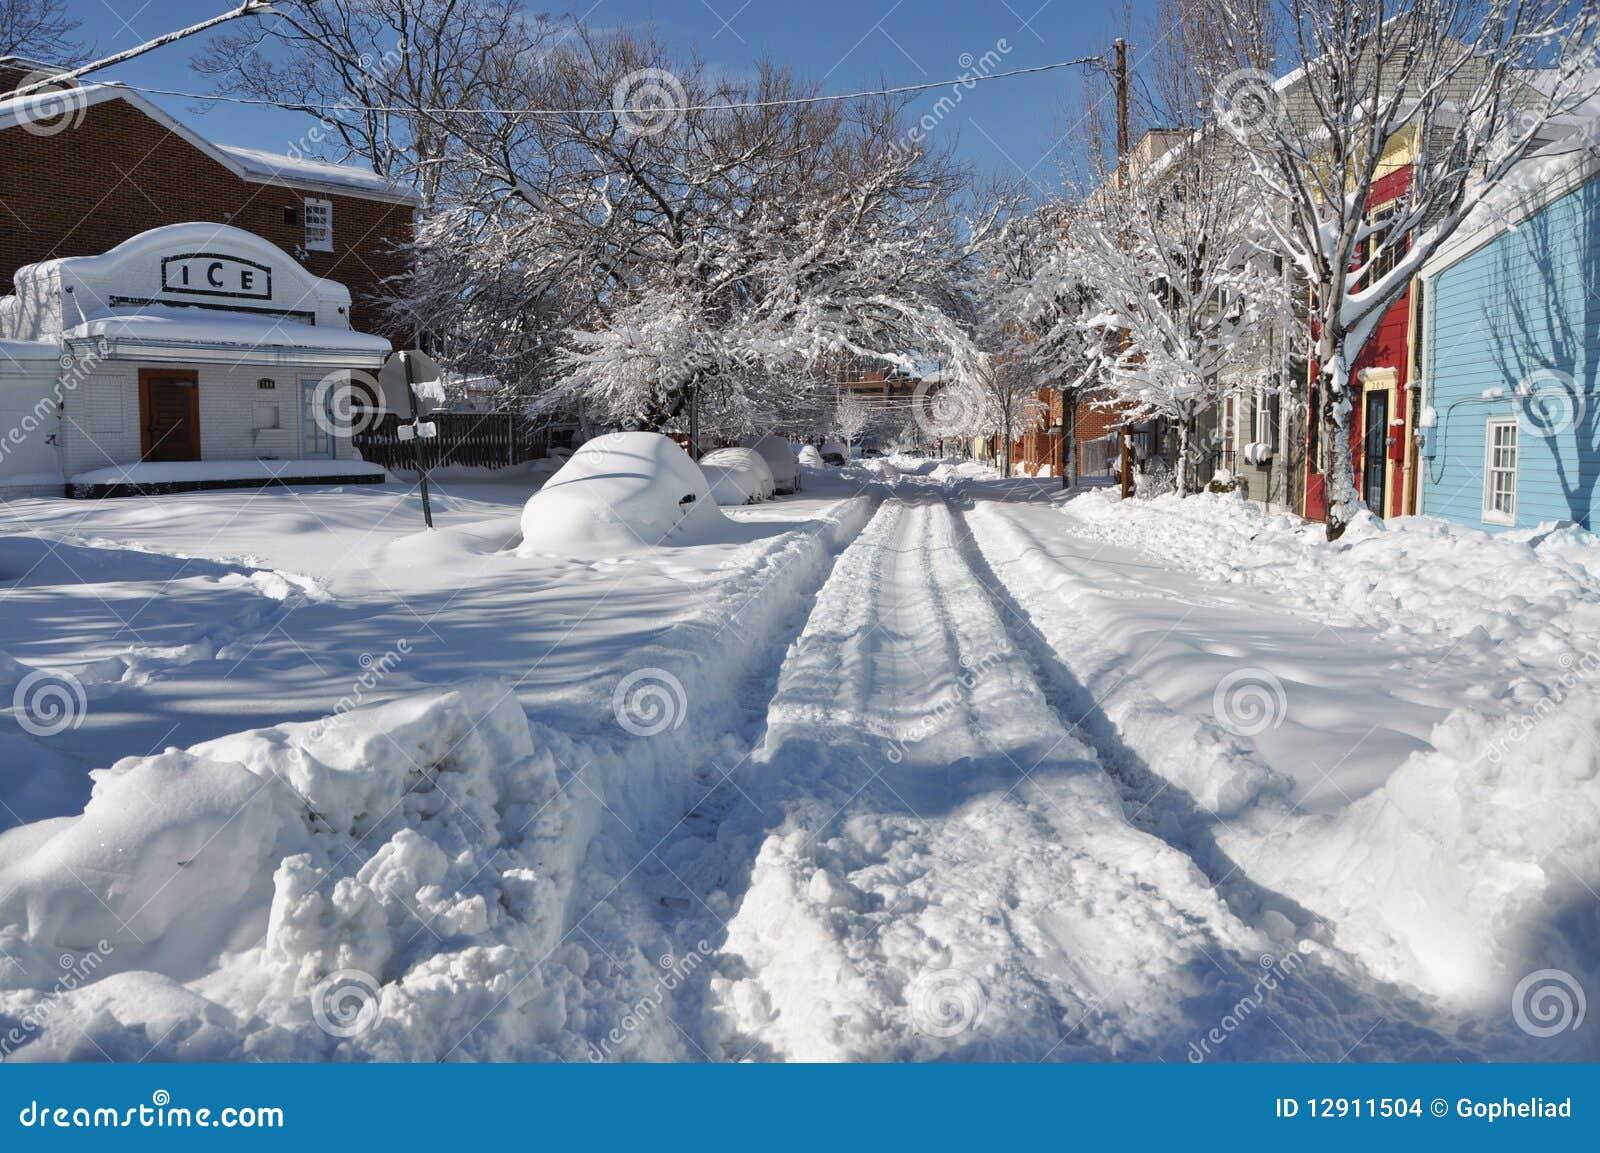 Snowy Neighborhood by catcolzelda on DeviantArt